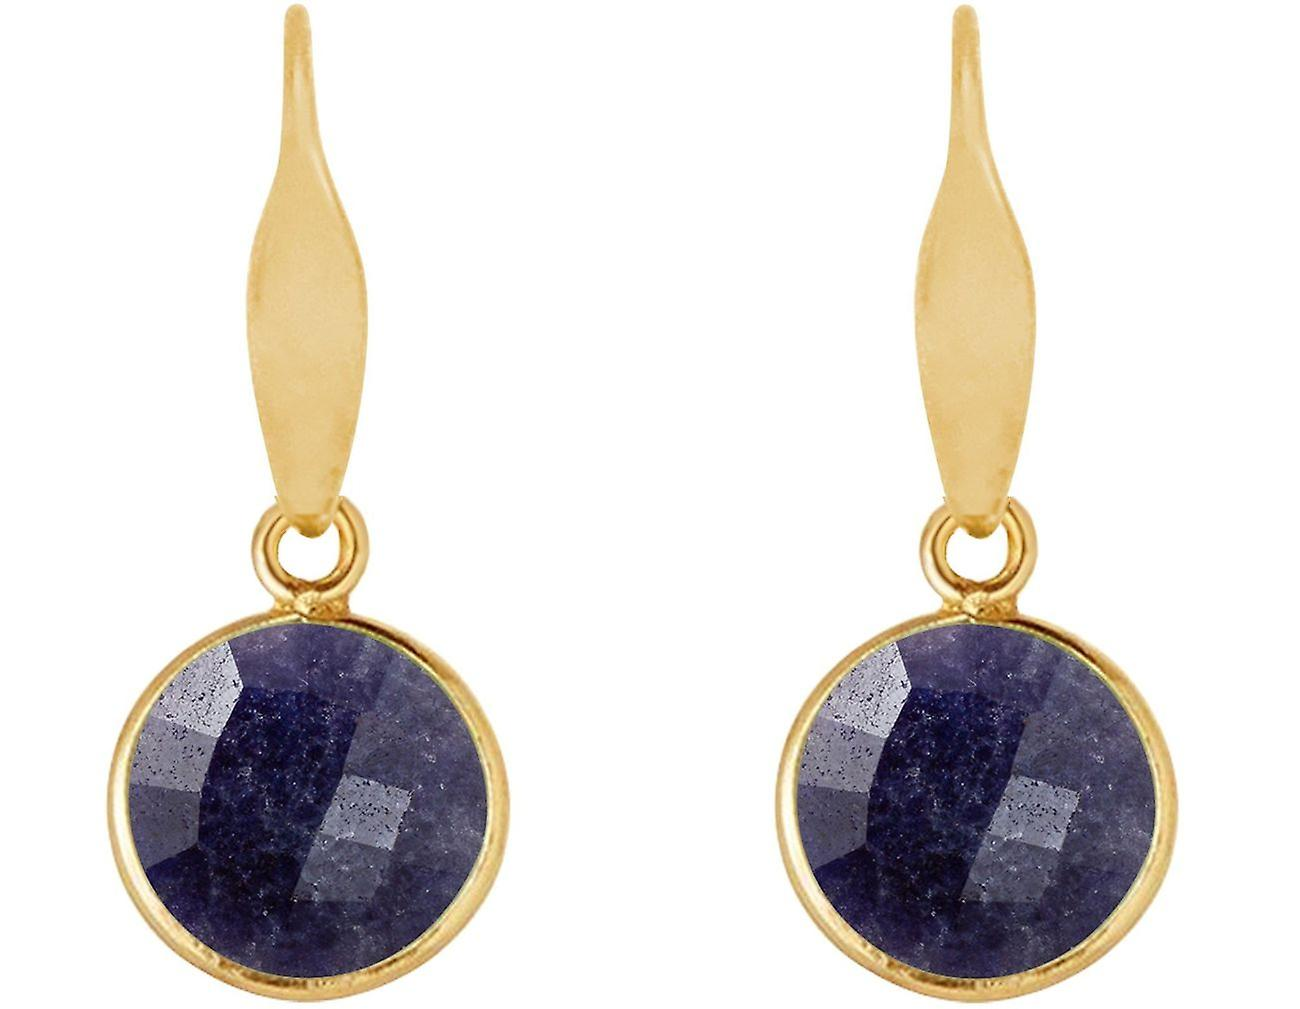 Gemshine Ohrringe blaue Saphiren Edelstein Tropfen 925 Silber, vergoldet, rose